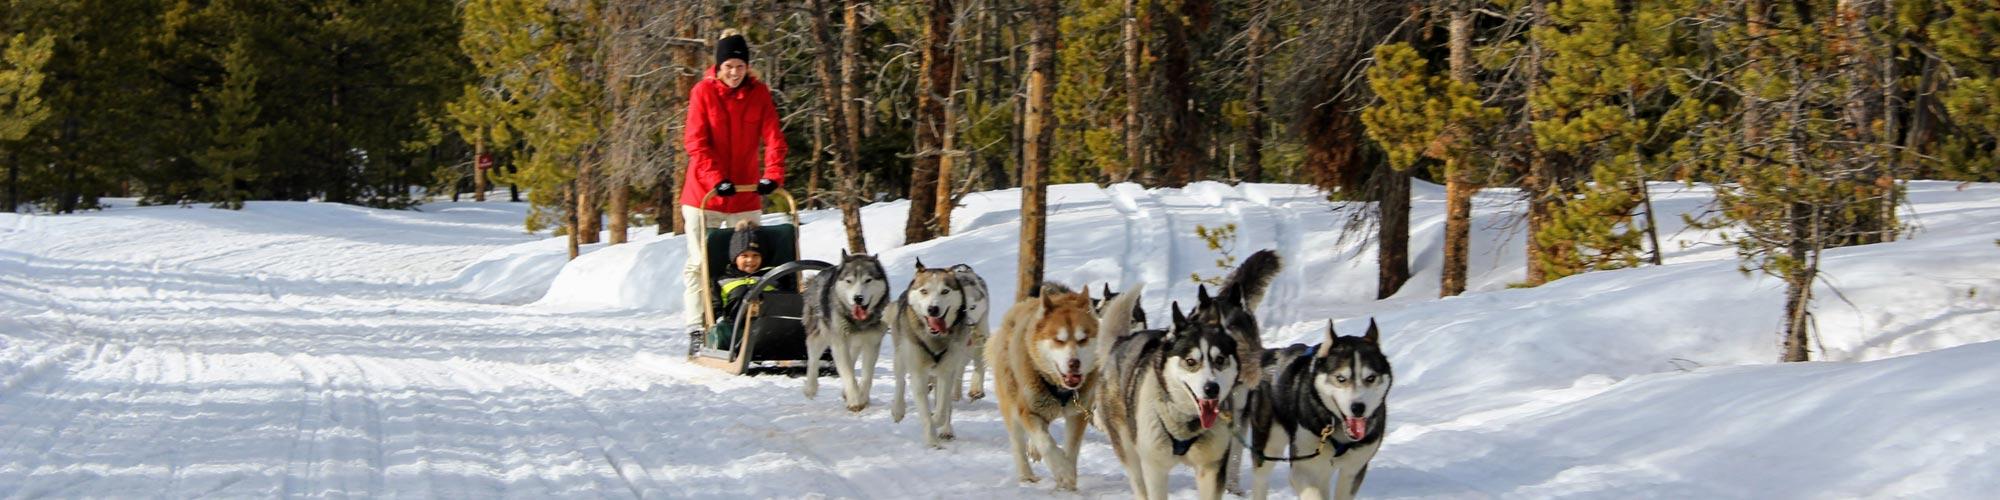 Winter dog sledding in Breckenridge